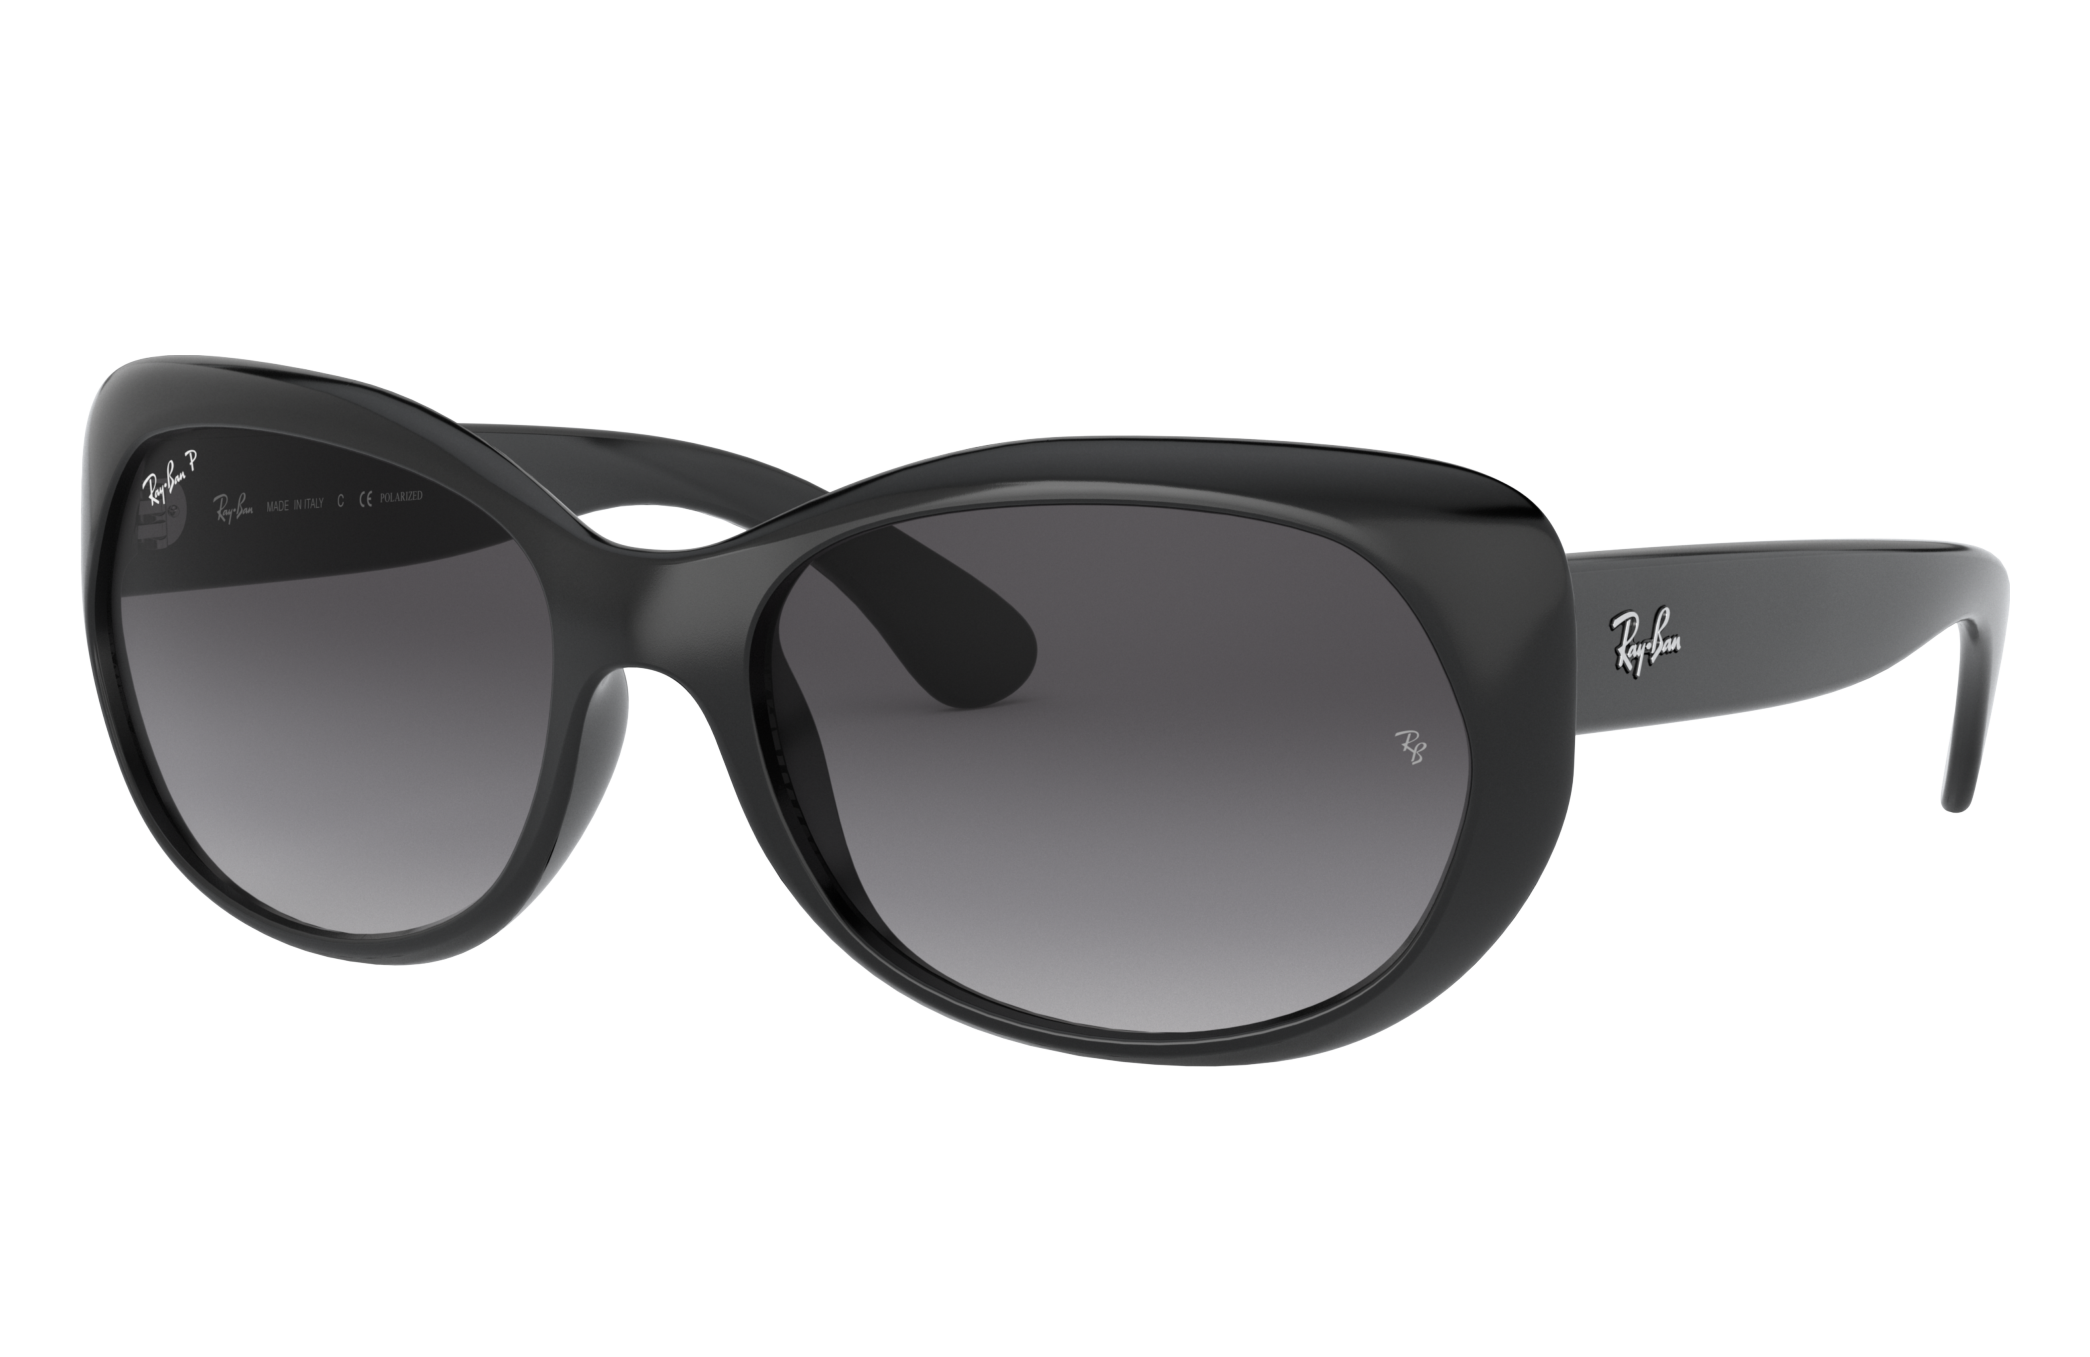 Ray-Ban Rb4325 Low Bridge Fit Black, Polarized Grey Lenses - RB4325F